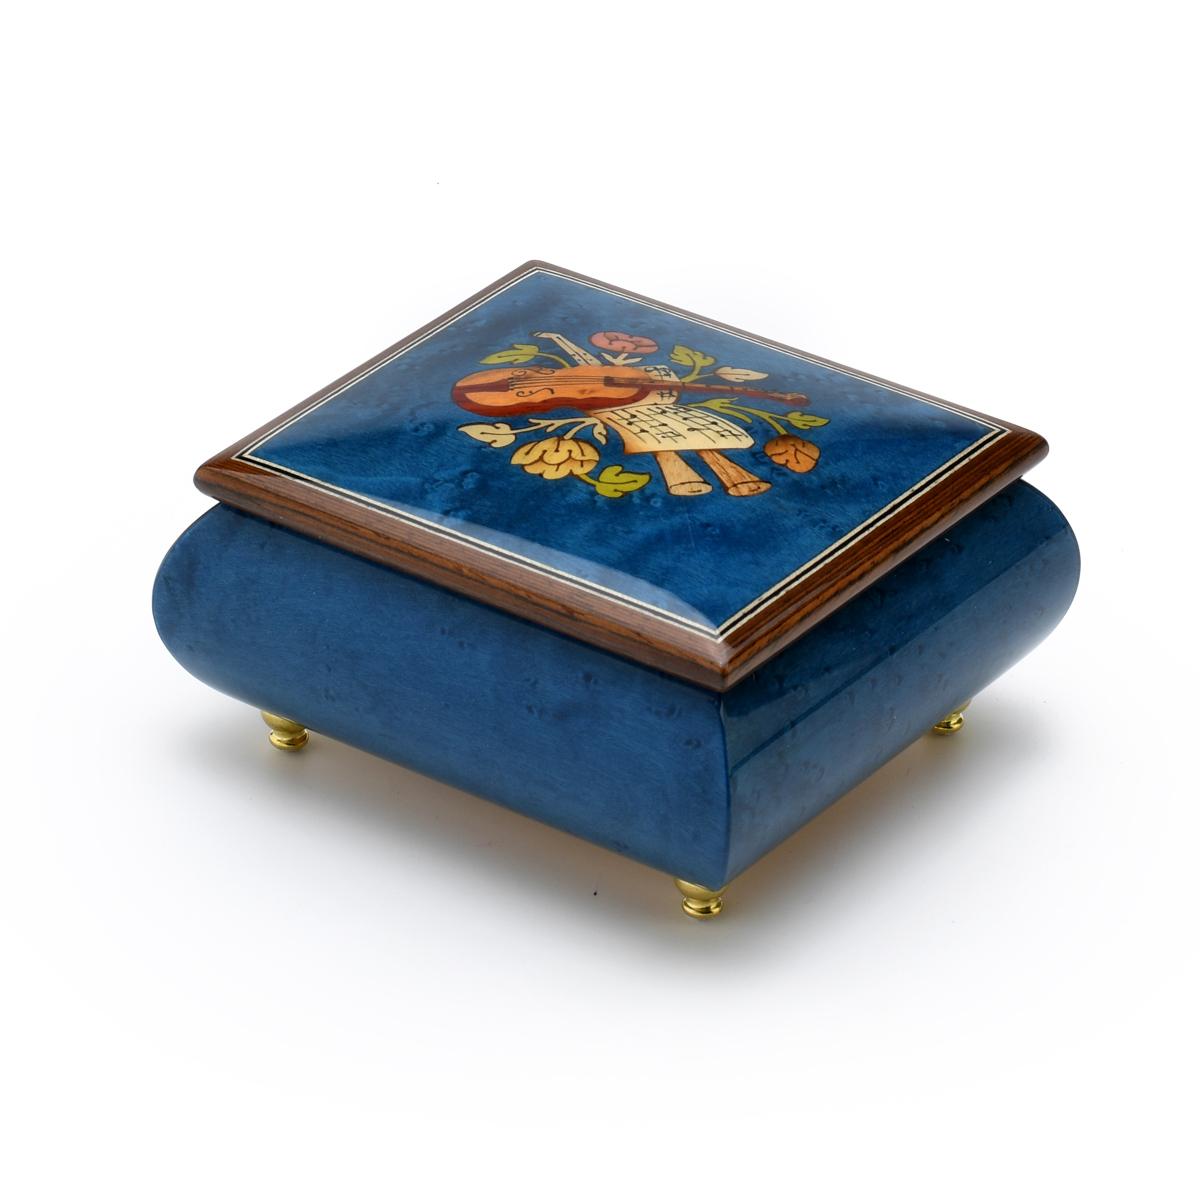 Inspiring Royal Blue Music Theme with Violin Wood Inlay Music Box